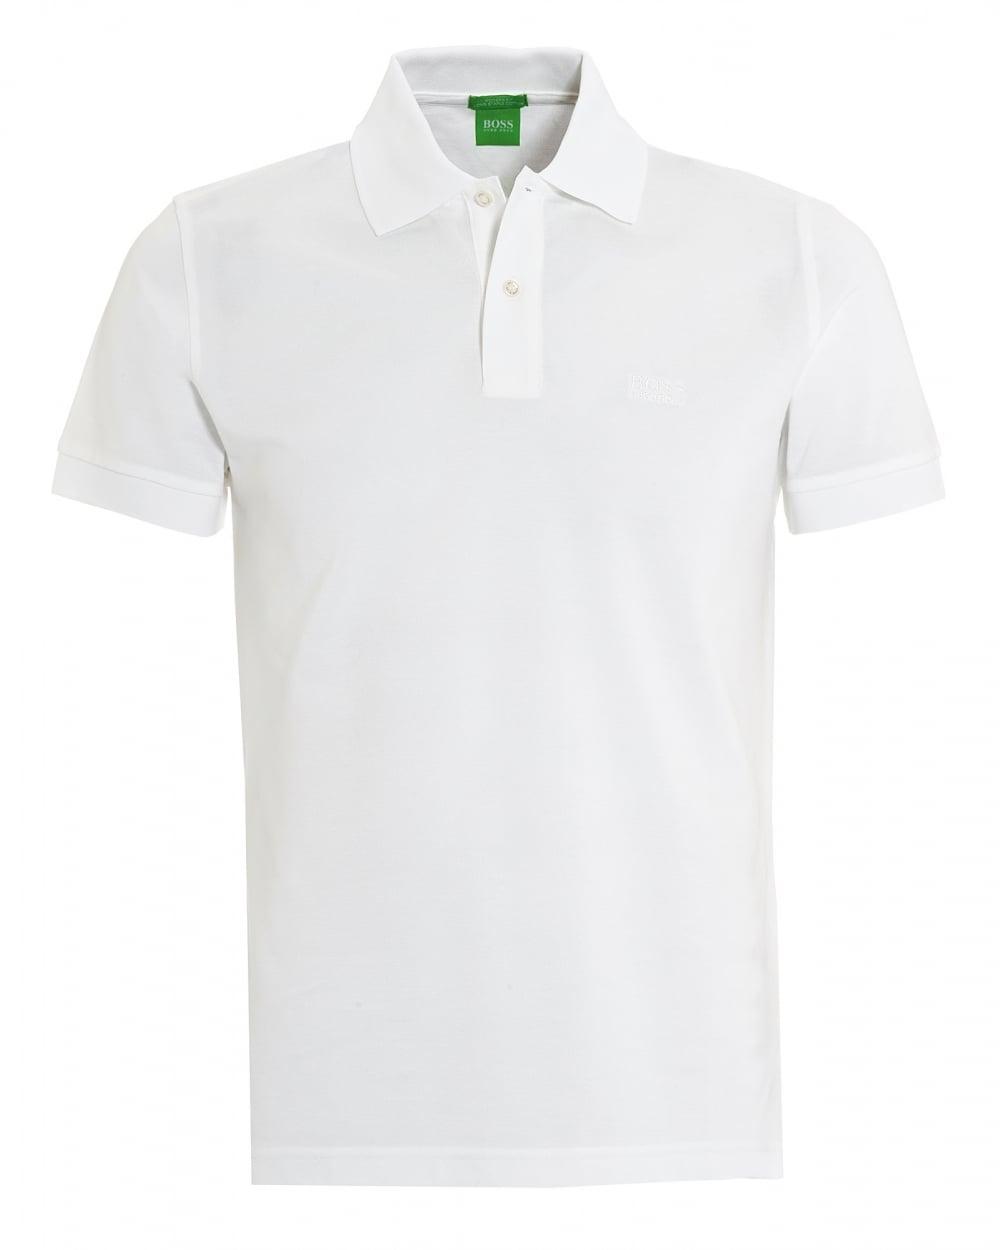 857884e3e Hugo Boss Green Mens C Firenze Logo Polo Regular Fit White Polo Shirt